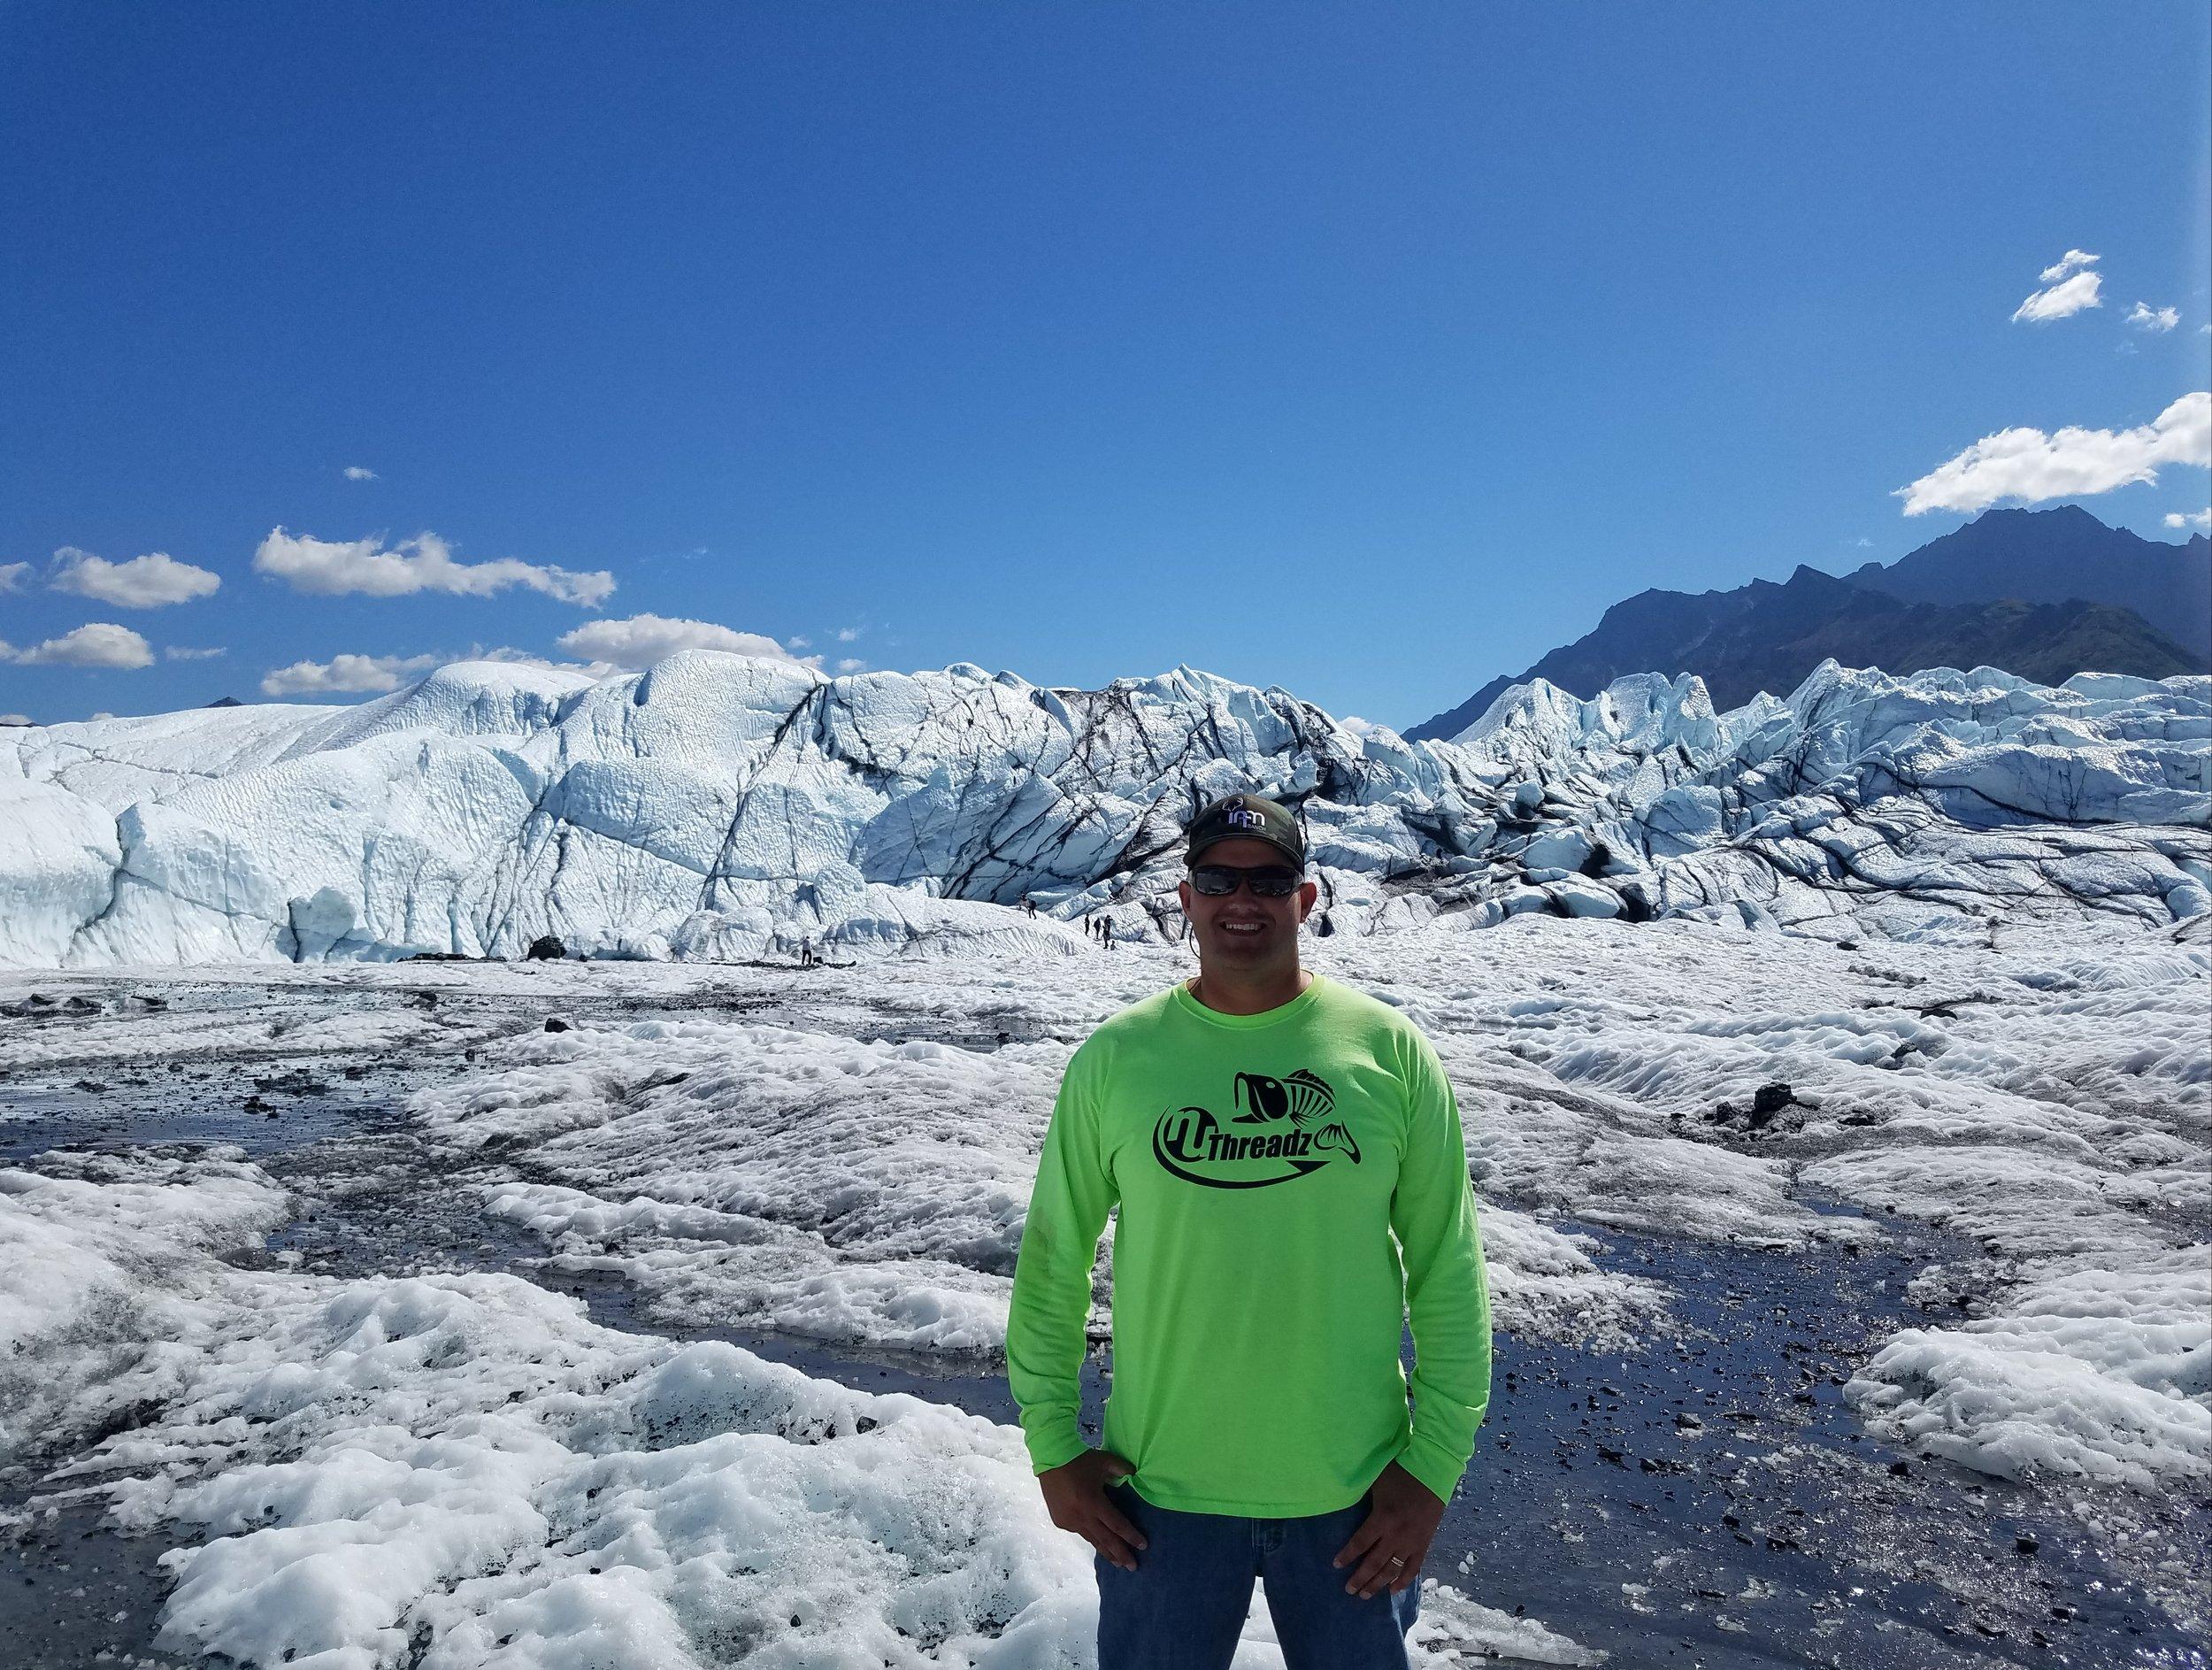 Blake at Matanuska glacier  (Nuthreadz shirt)